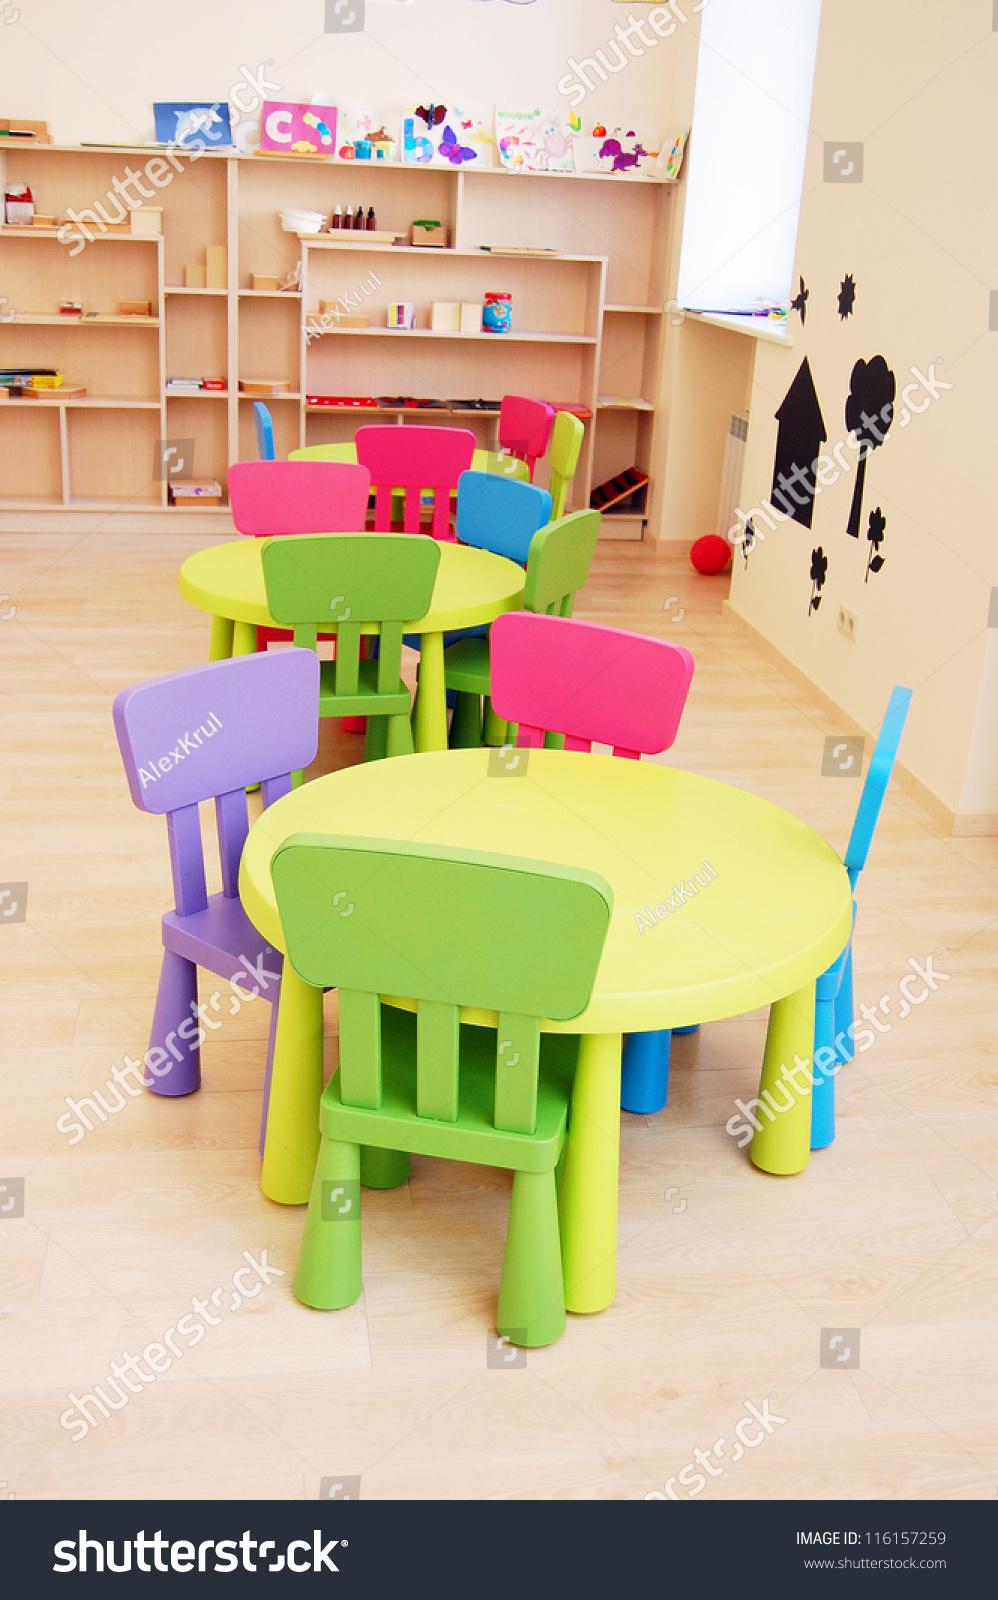 Montessori Kindergarten Preschool Classroom Table Chairs